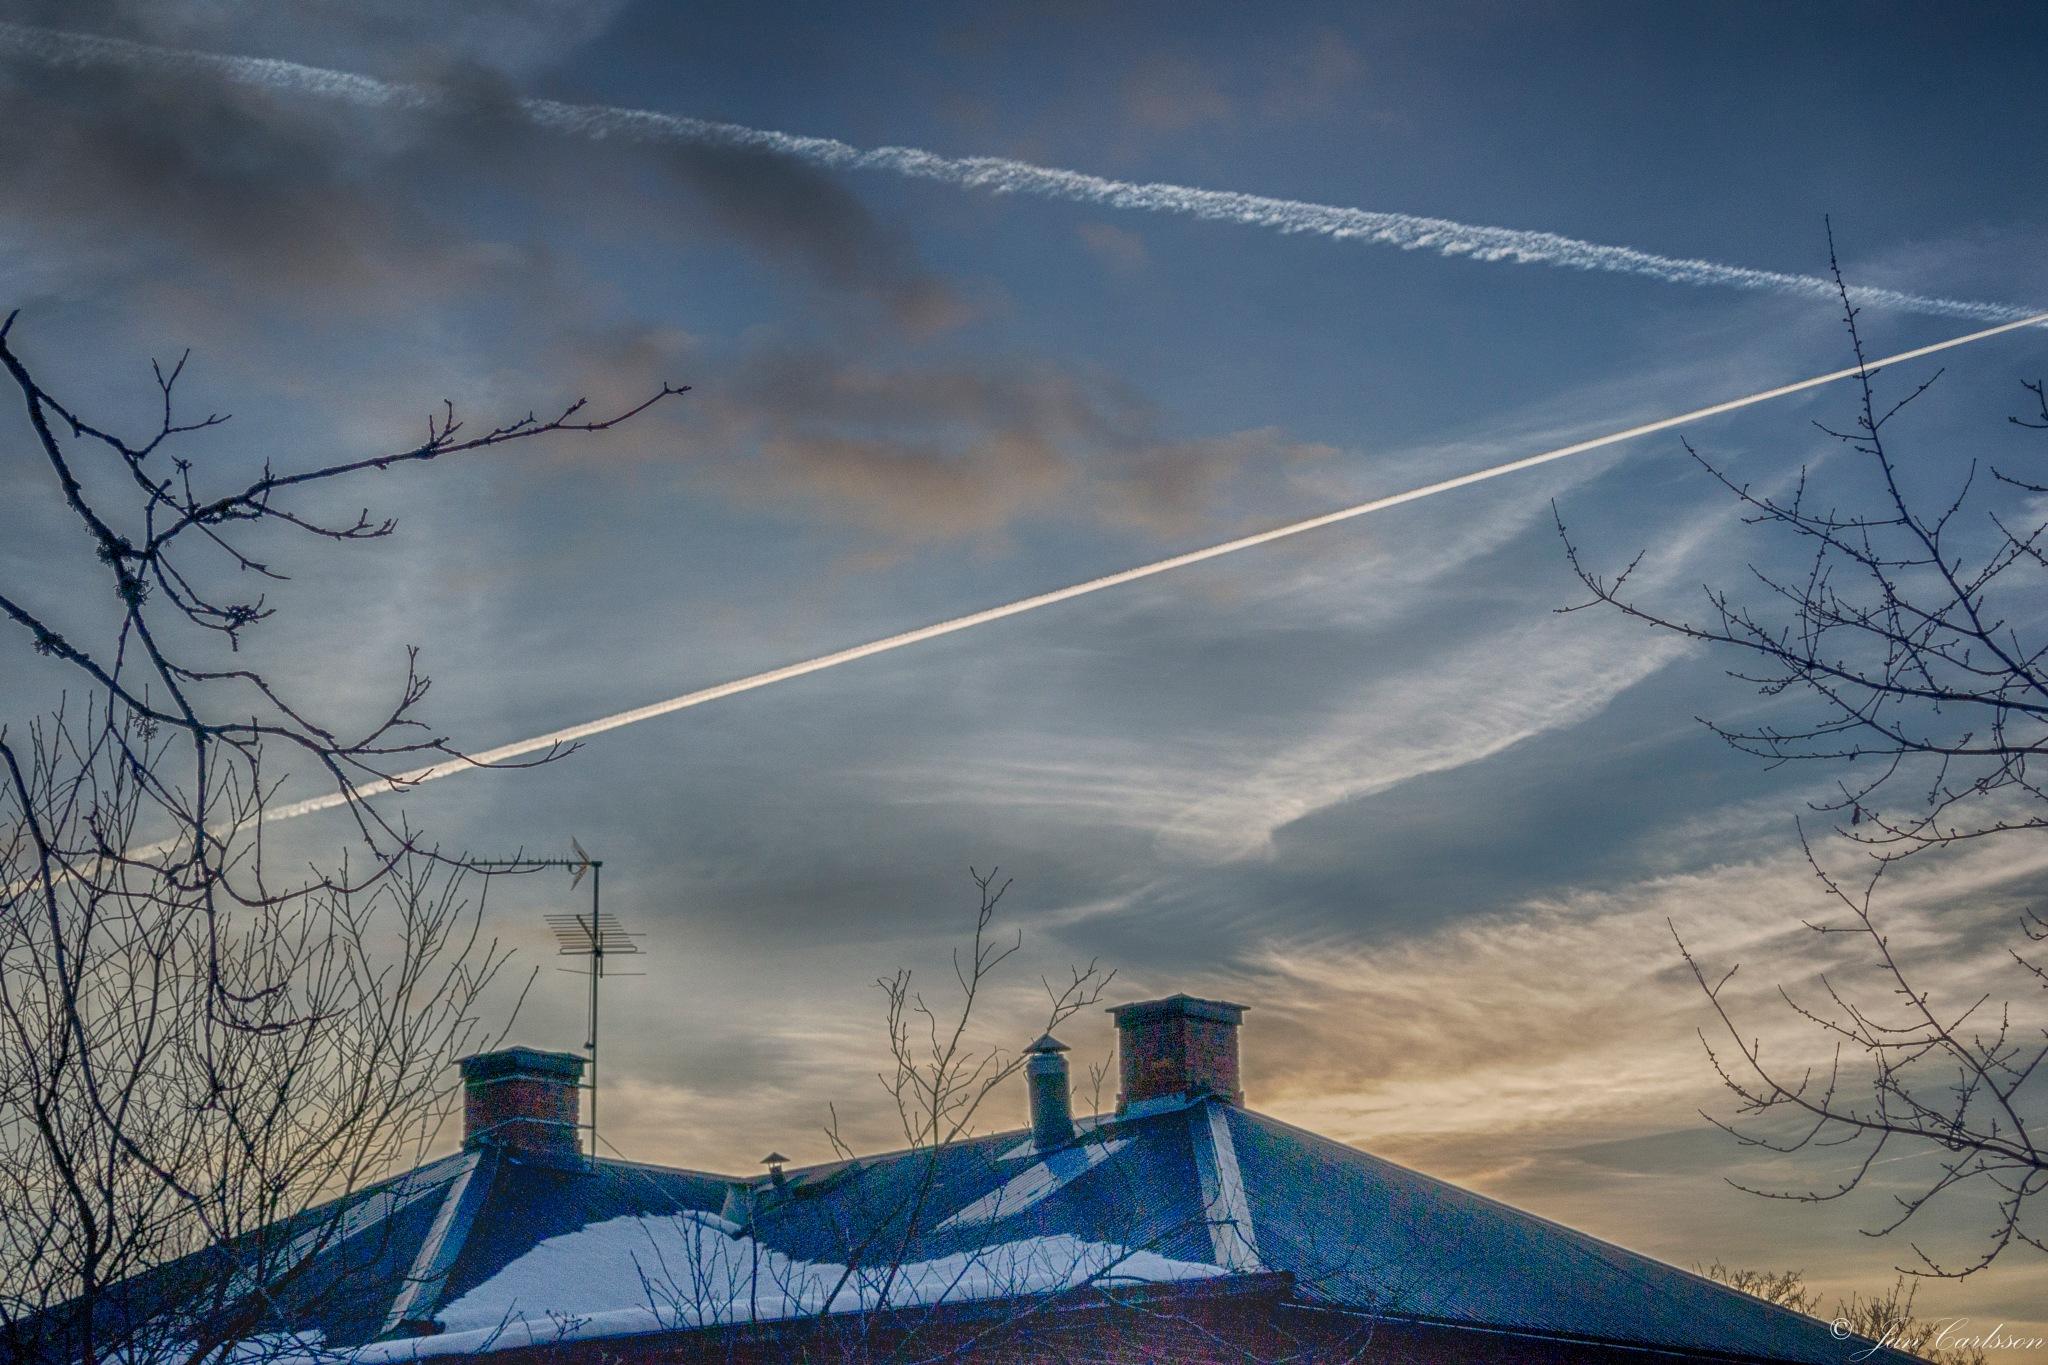 March Evening in the Countryside II by carljan w carlsson